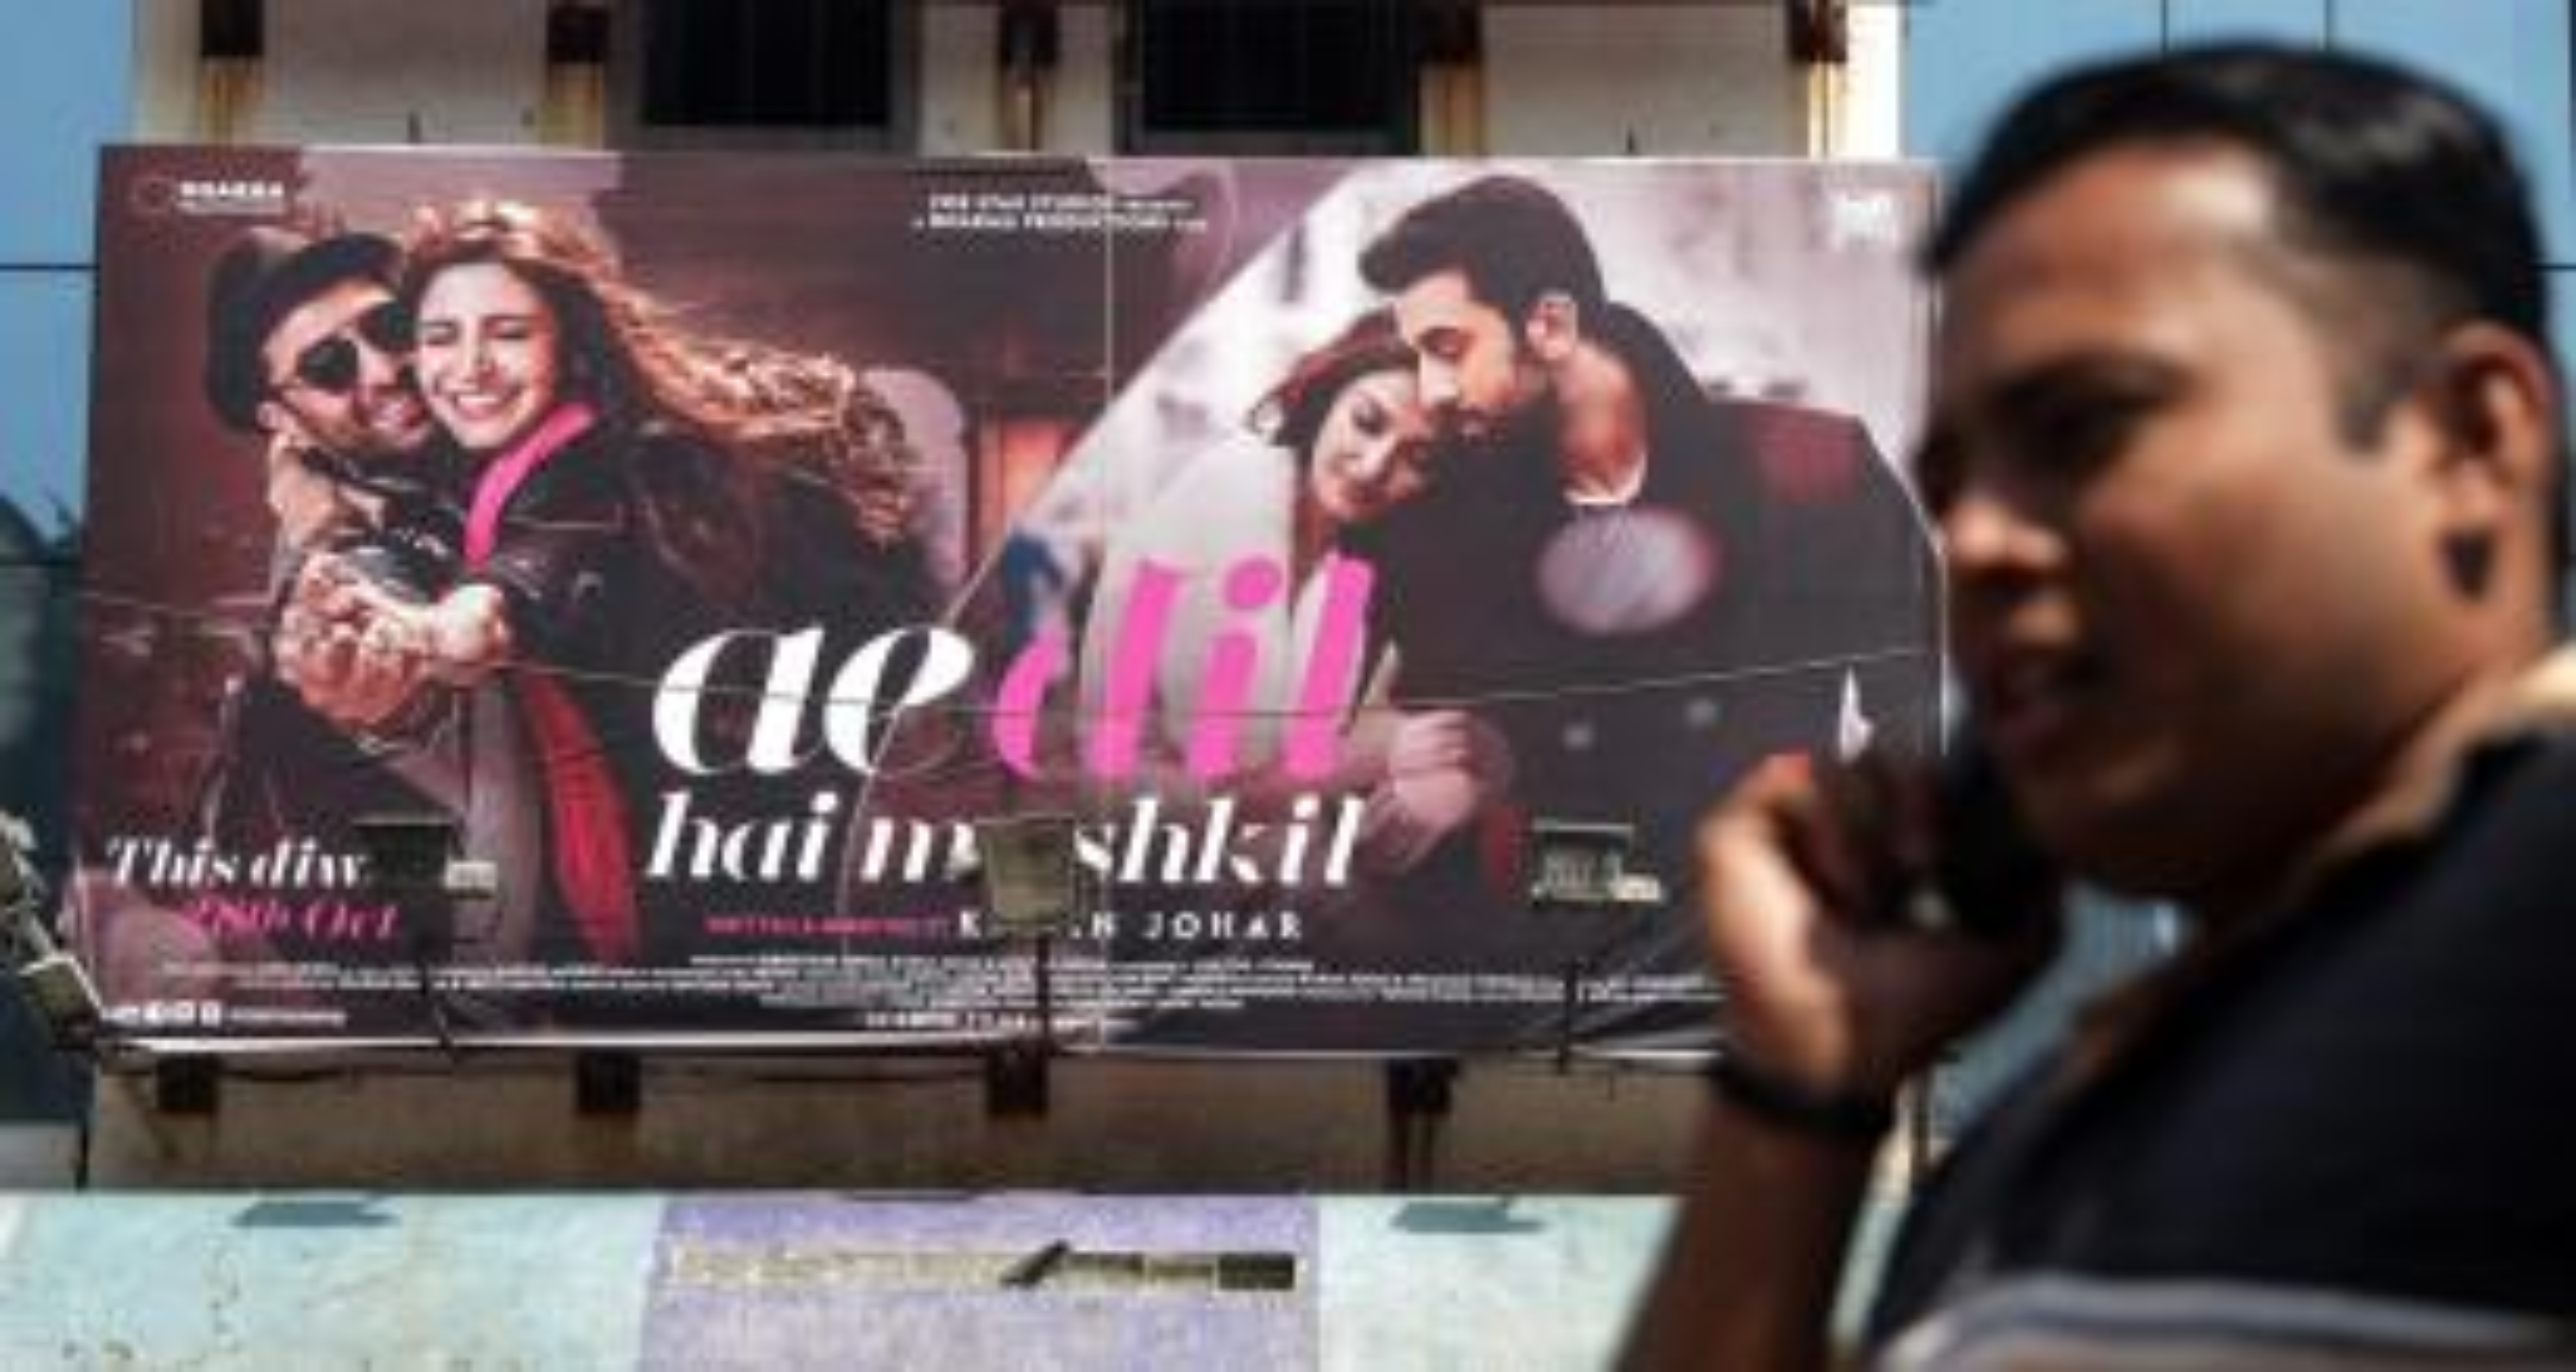 Theater screening the Bollywood movie Ae Dil Hai Mushkil.